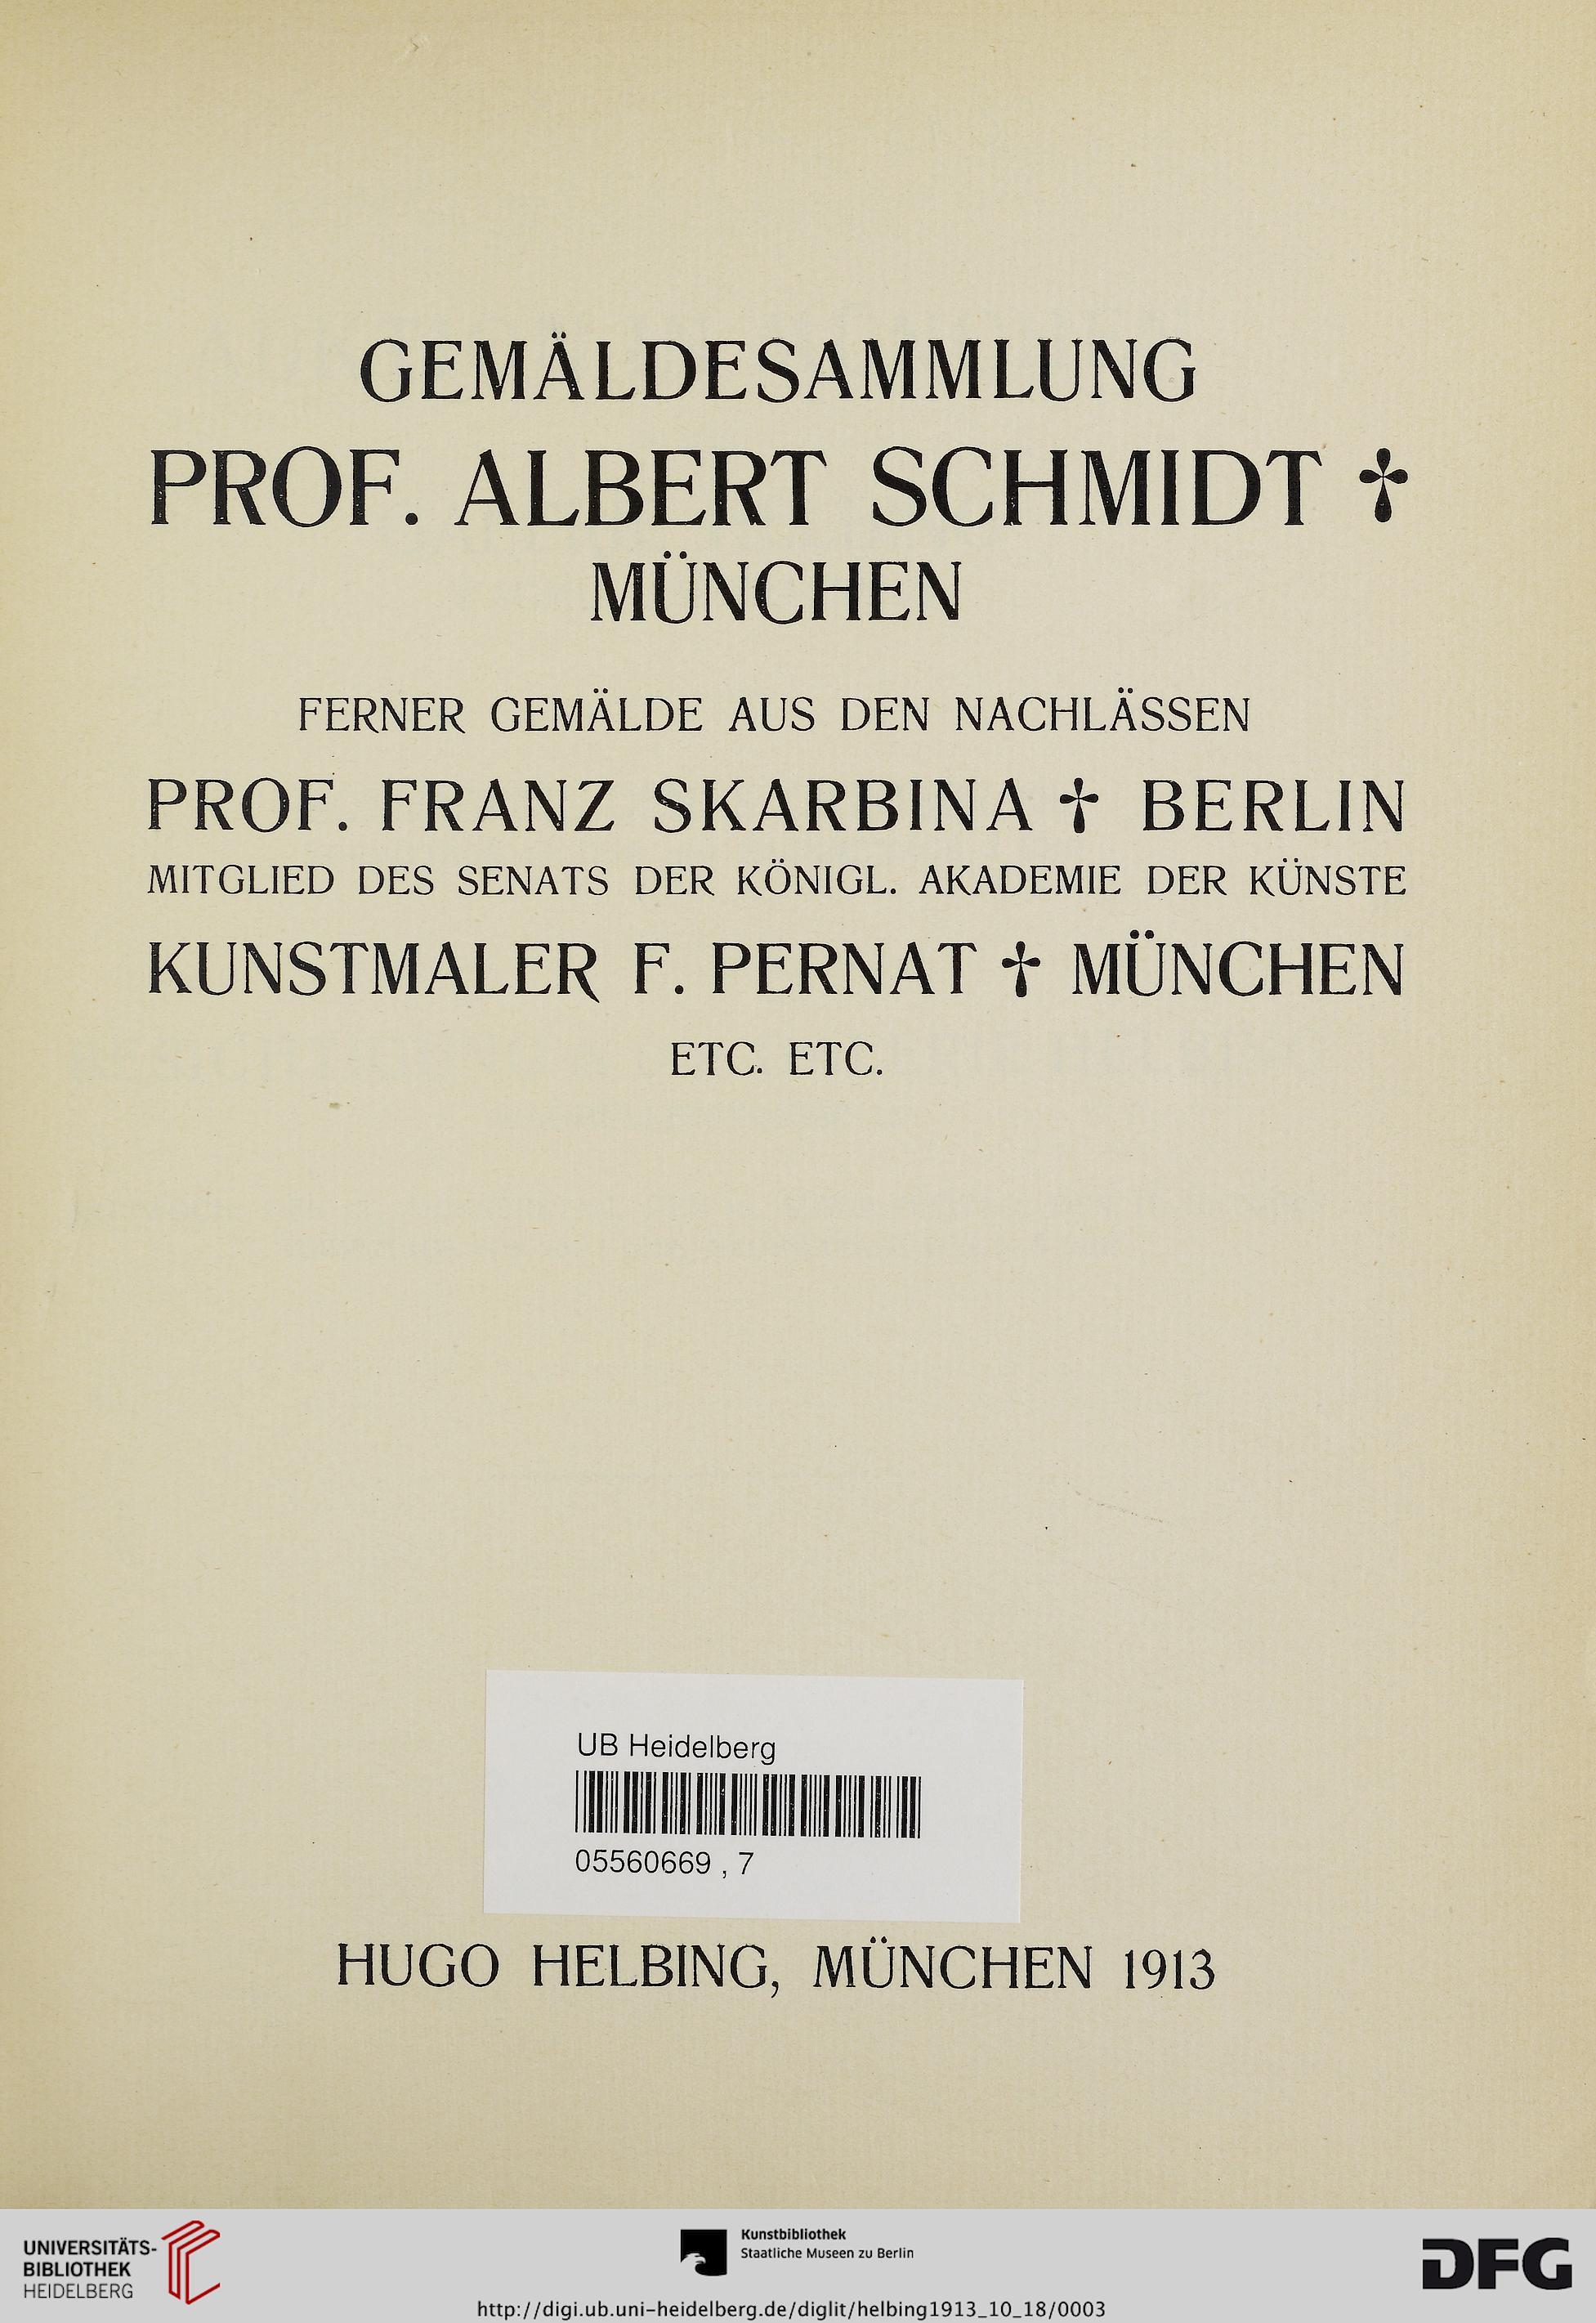 Hugo Helbing München Hrsg Gemäldesammlung Professor Albert